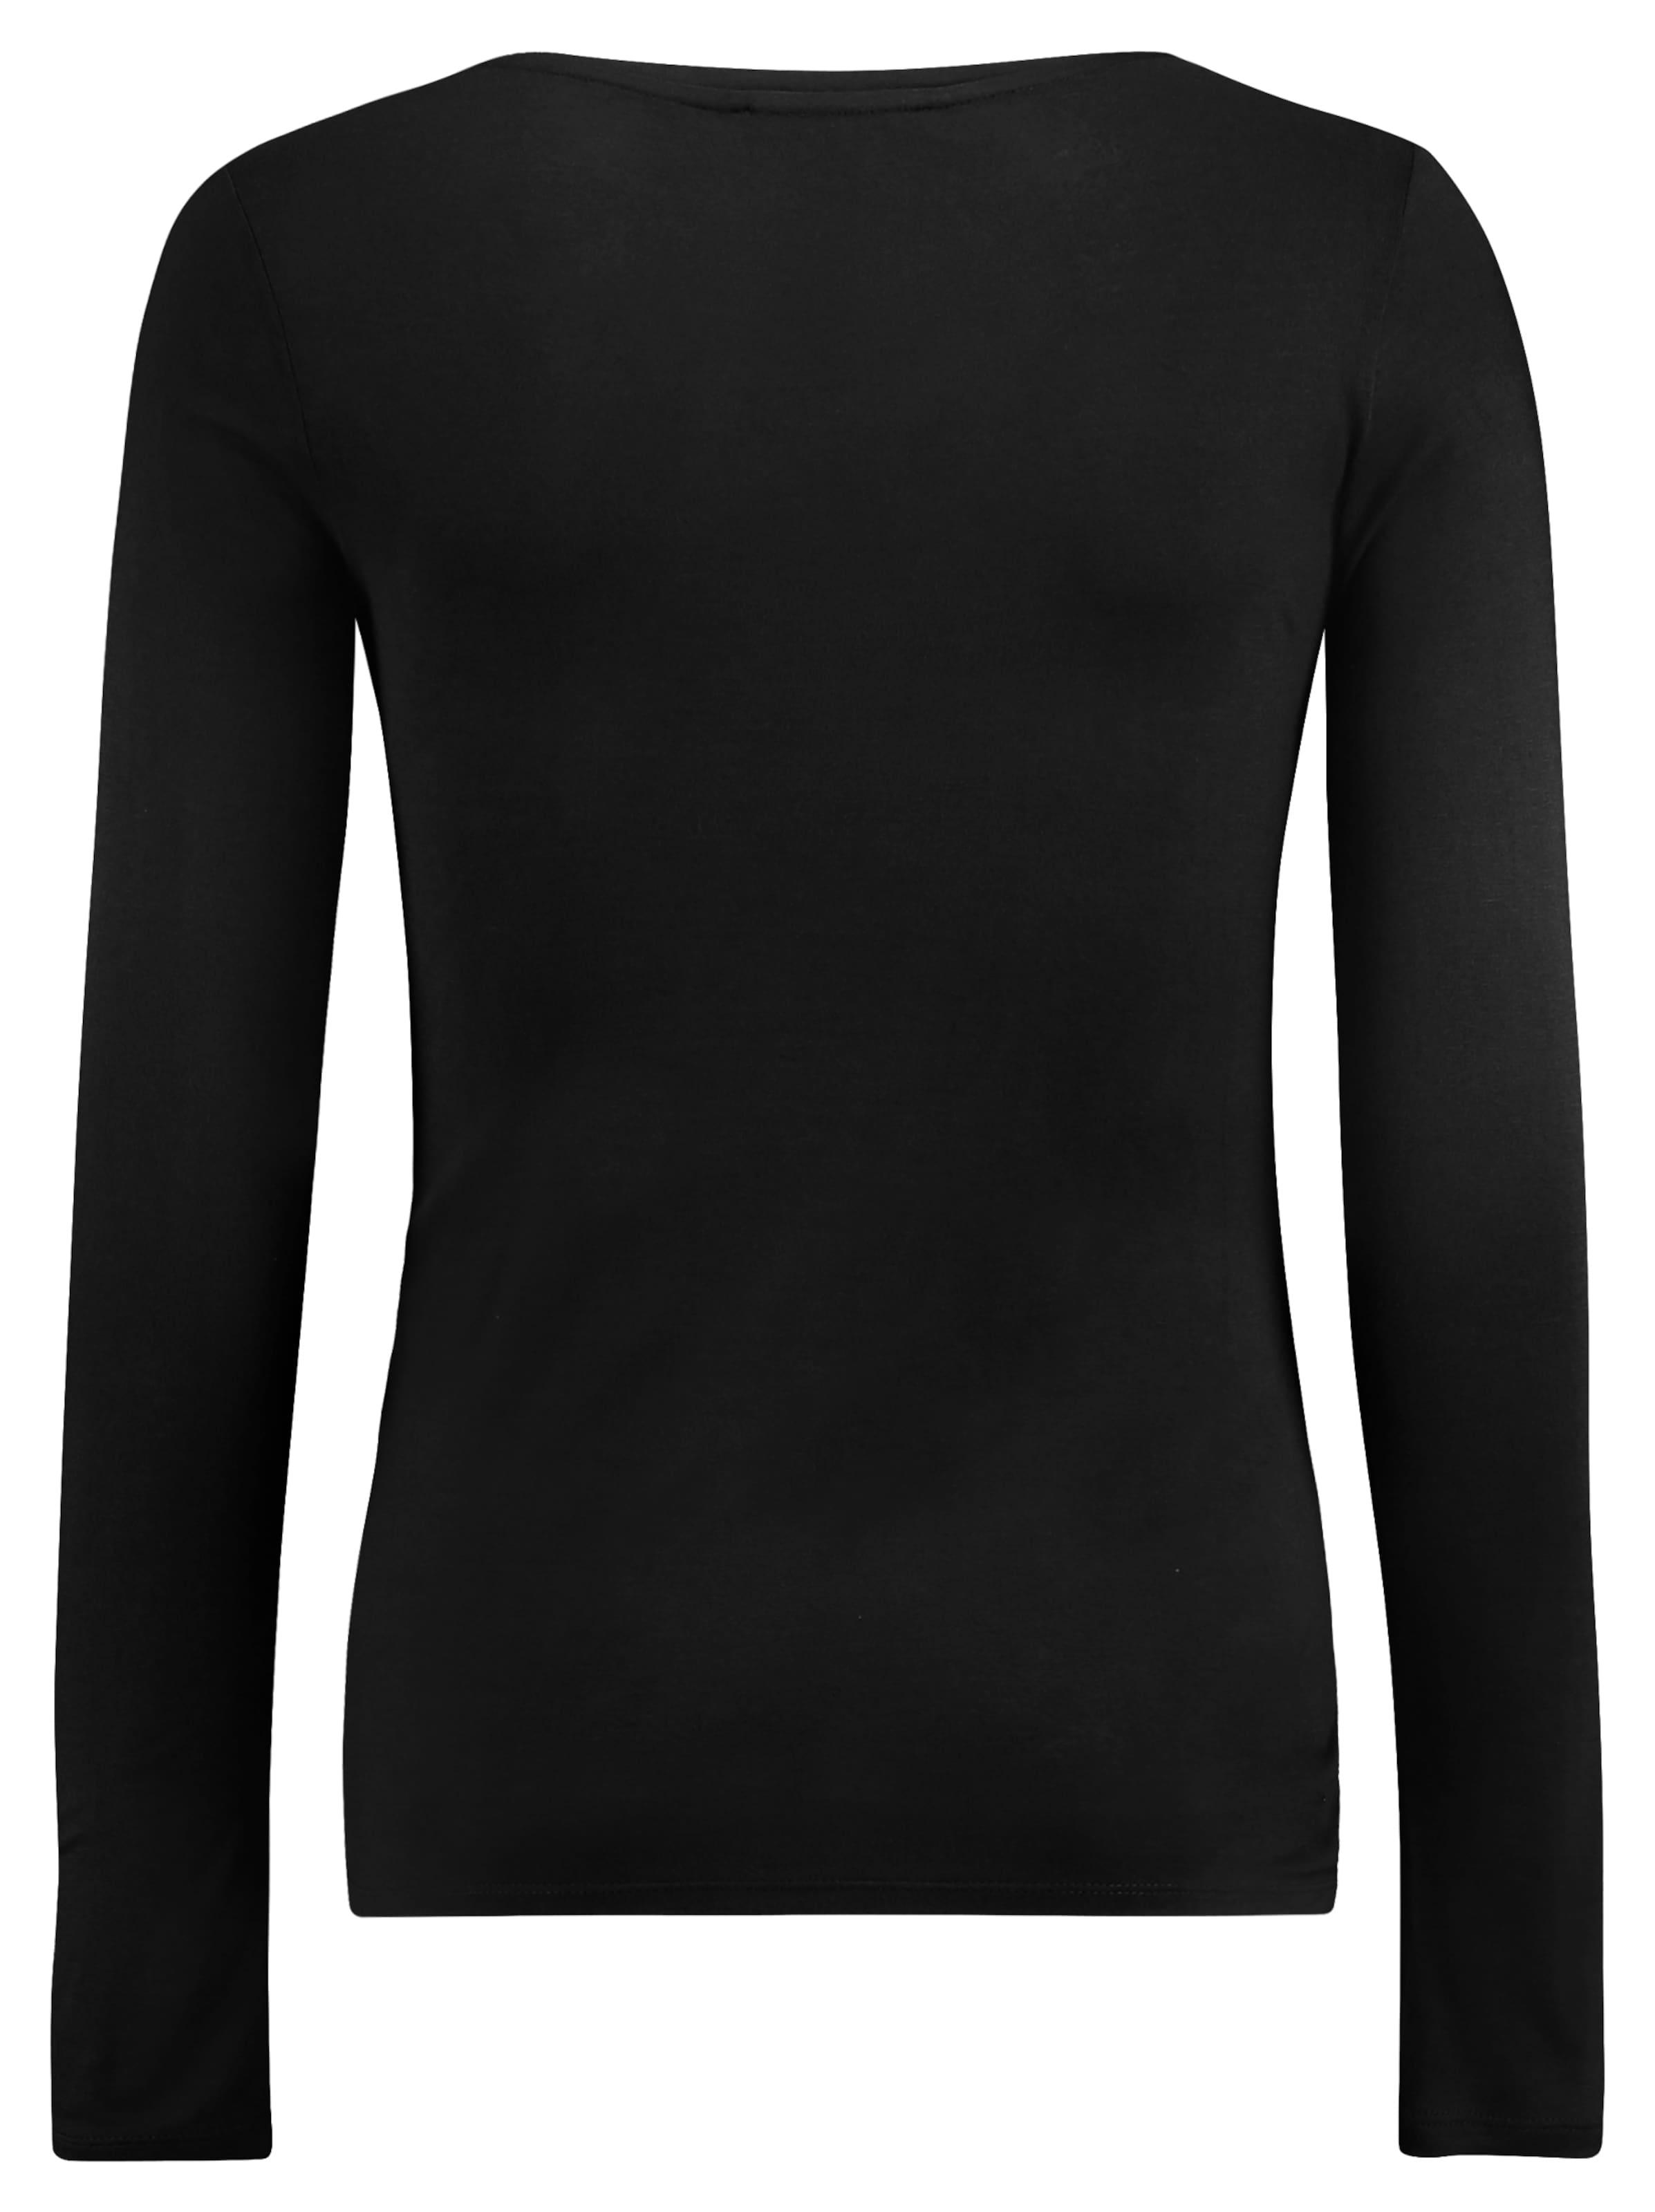 shirt In Schwarz Esprit Maternity T CrdsxQth